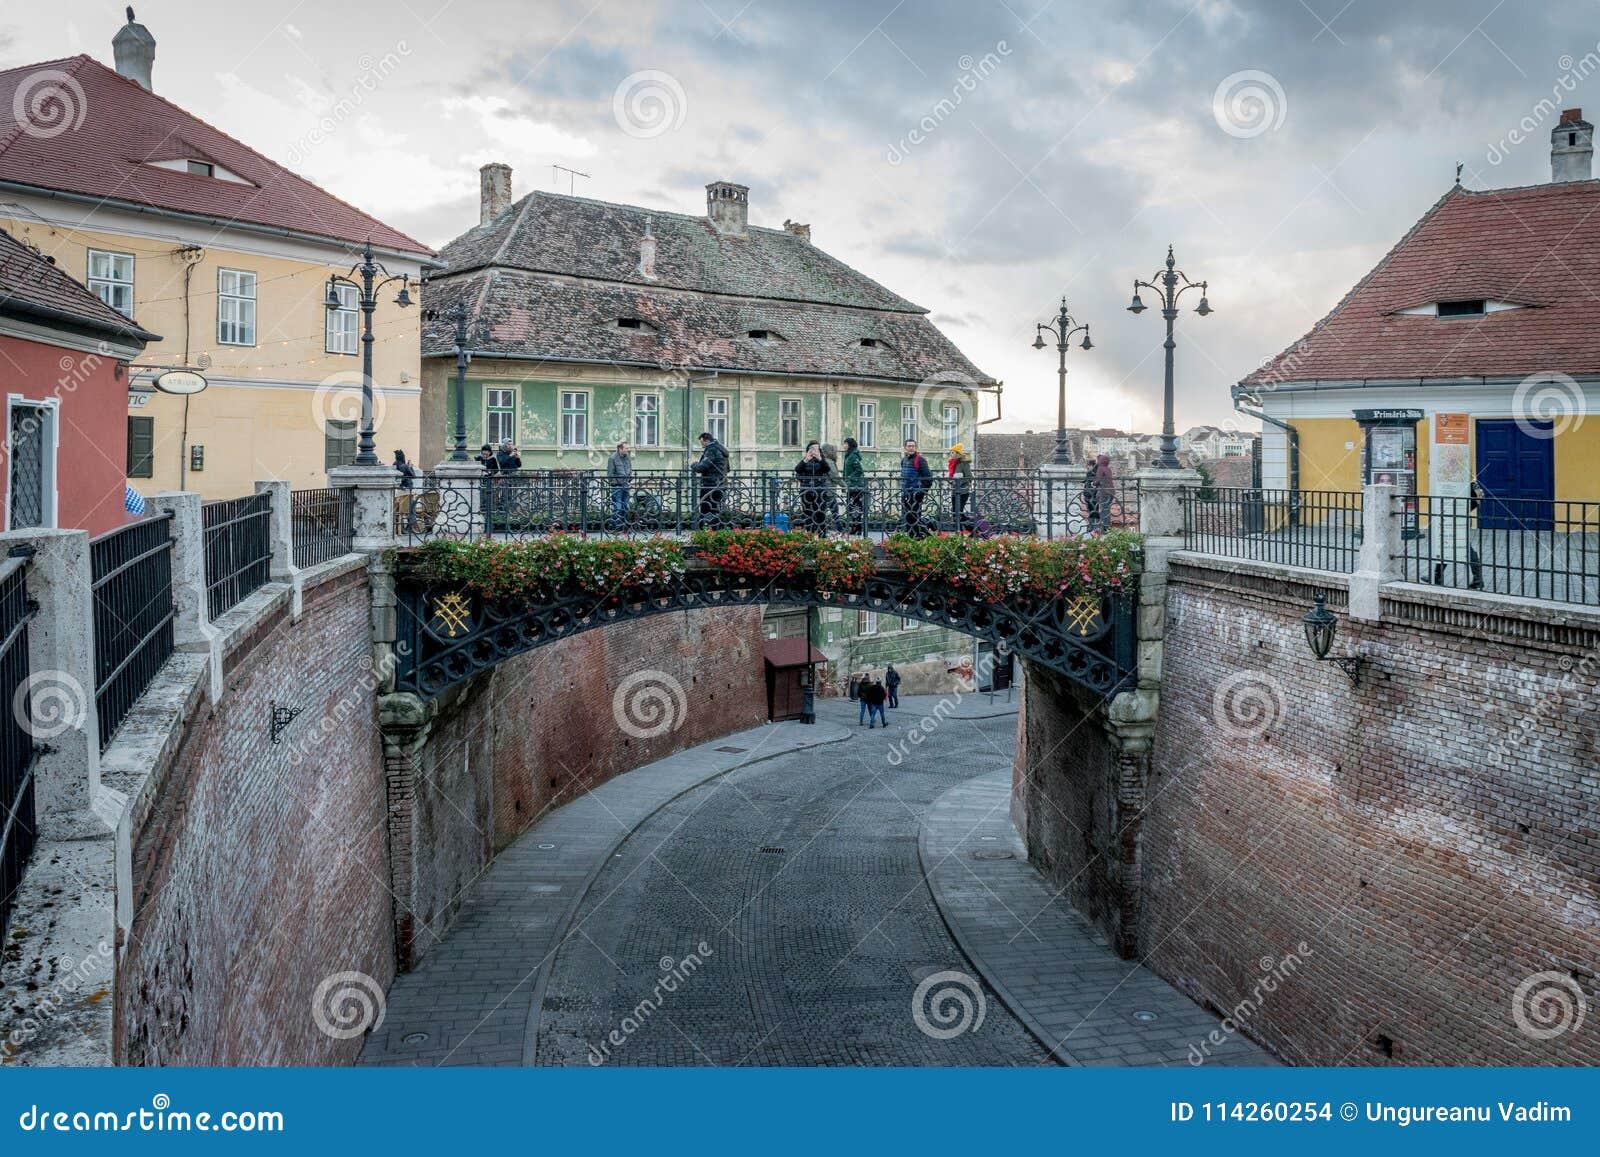 SIBIU, ROMANIA - 30 OCTOBER, 2017: The bridge of lies in the historical center of Sibiu